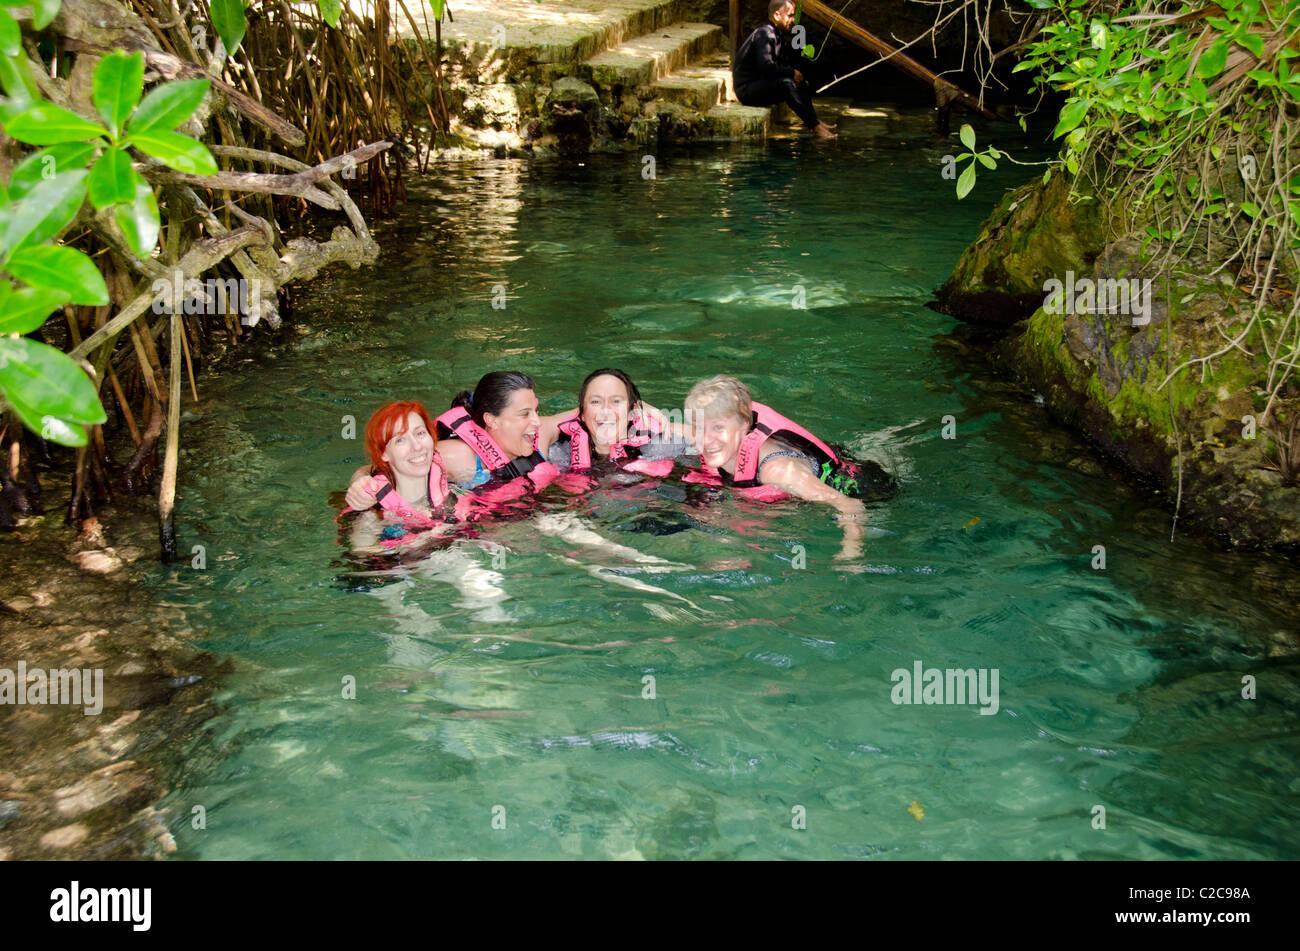 Mexico Quintana Roo Playa Del Carmen Xcaret Underground River Stock Photo Royalty Free